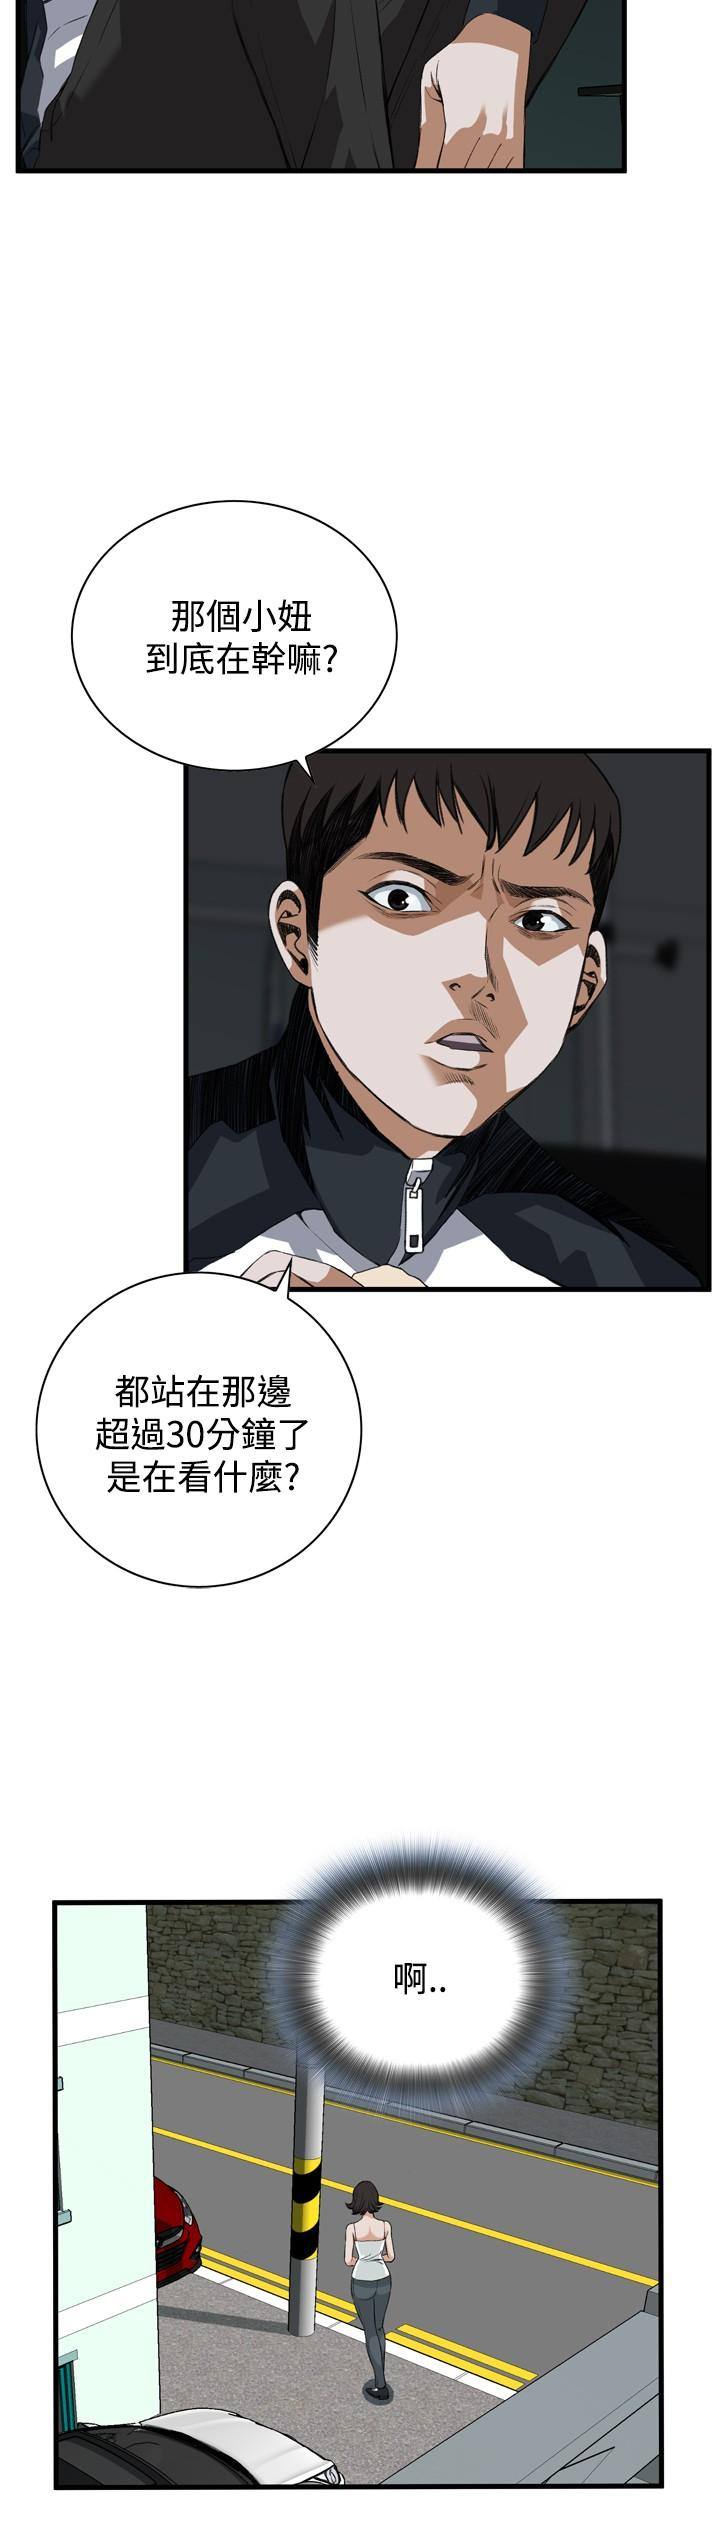 Take a Peek 偷窥 Ch.39~55 [Chinese]中文 218